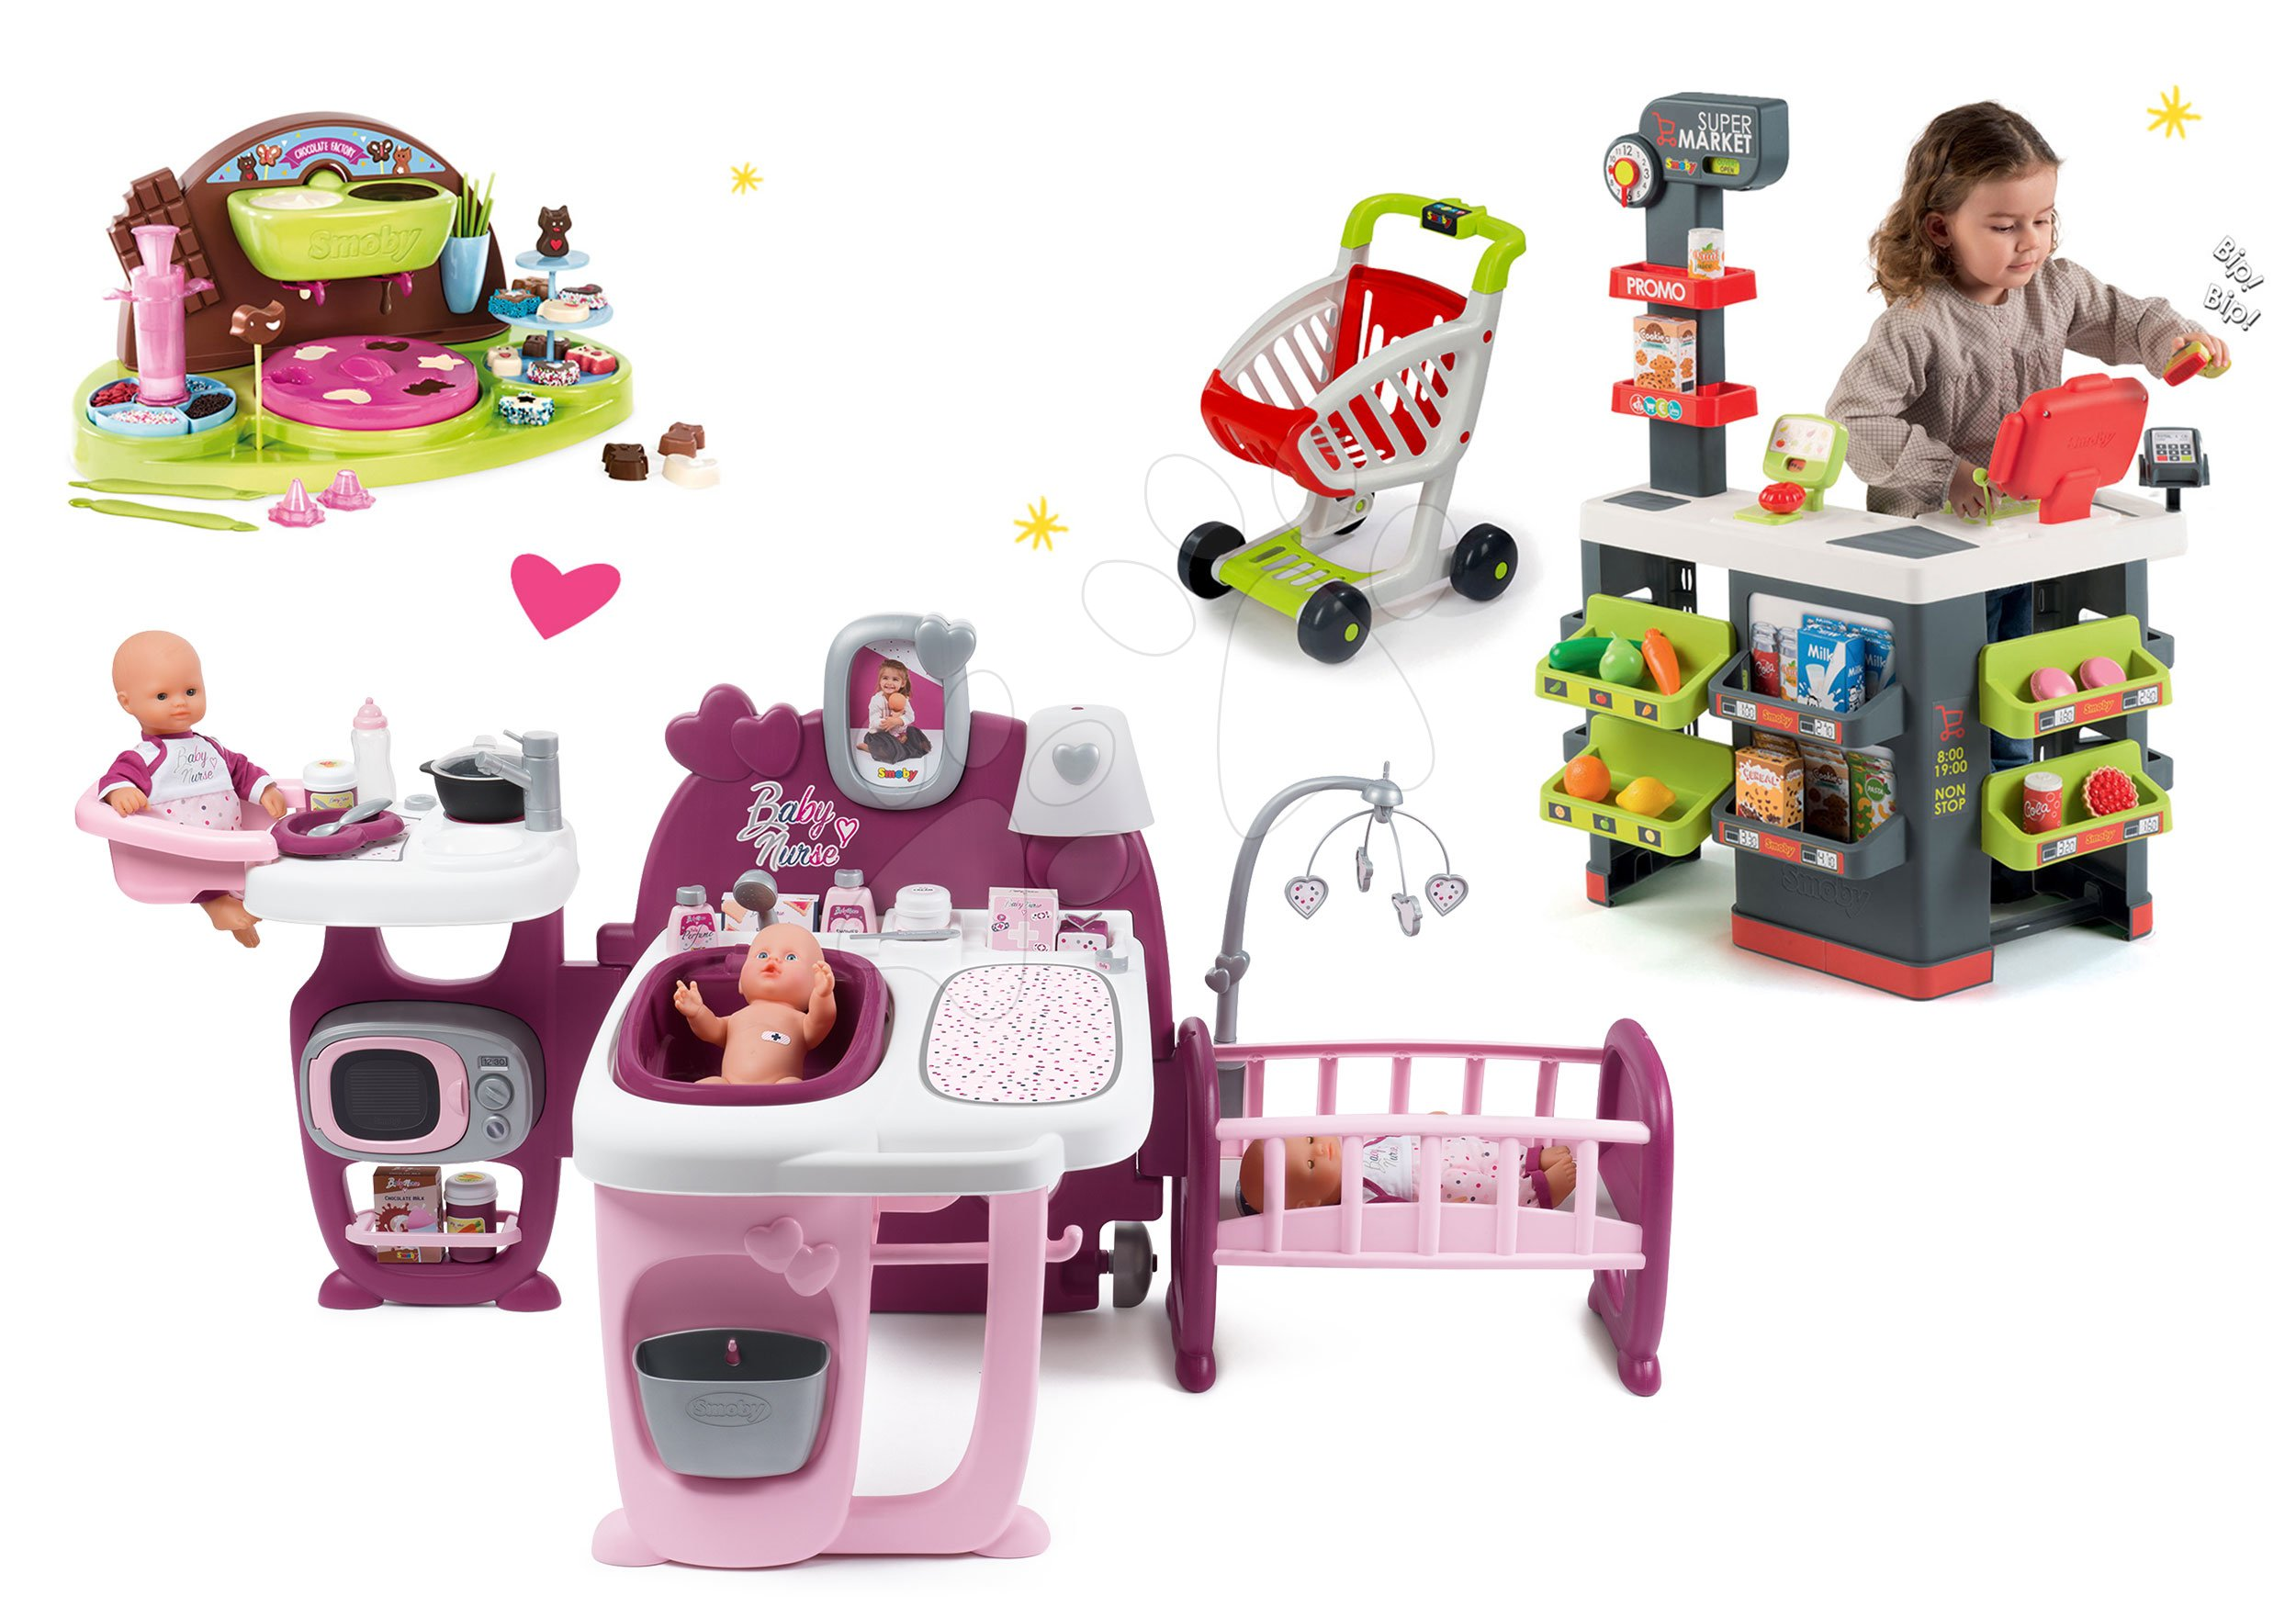 Smoby set domeček pro panenku Baby Nurse Doll´s Play Center a obchod s vozíkem a hravá kuchařka Čokoládovna 220327-11